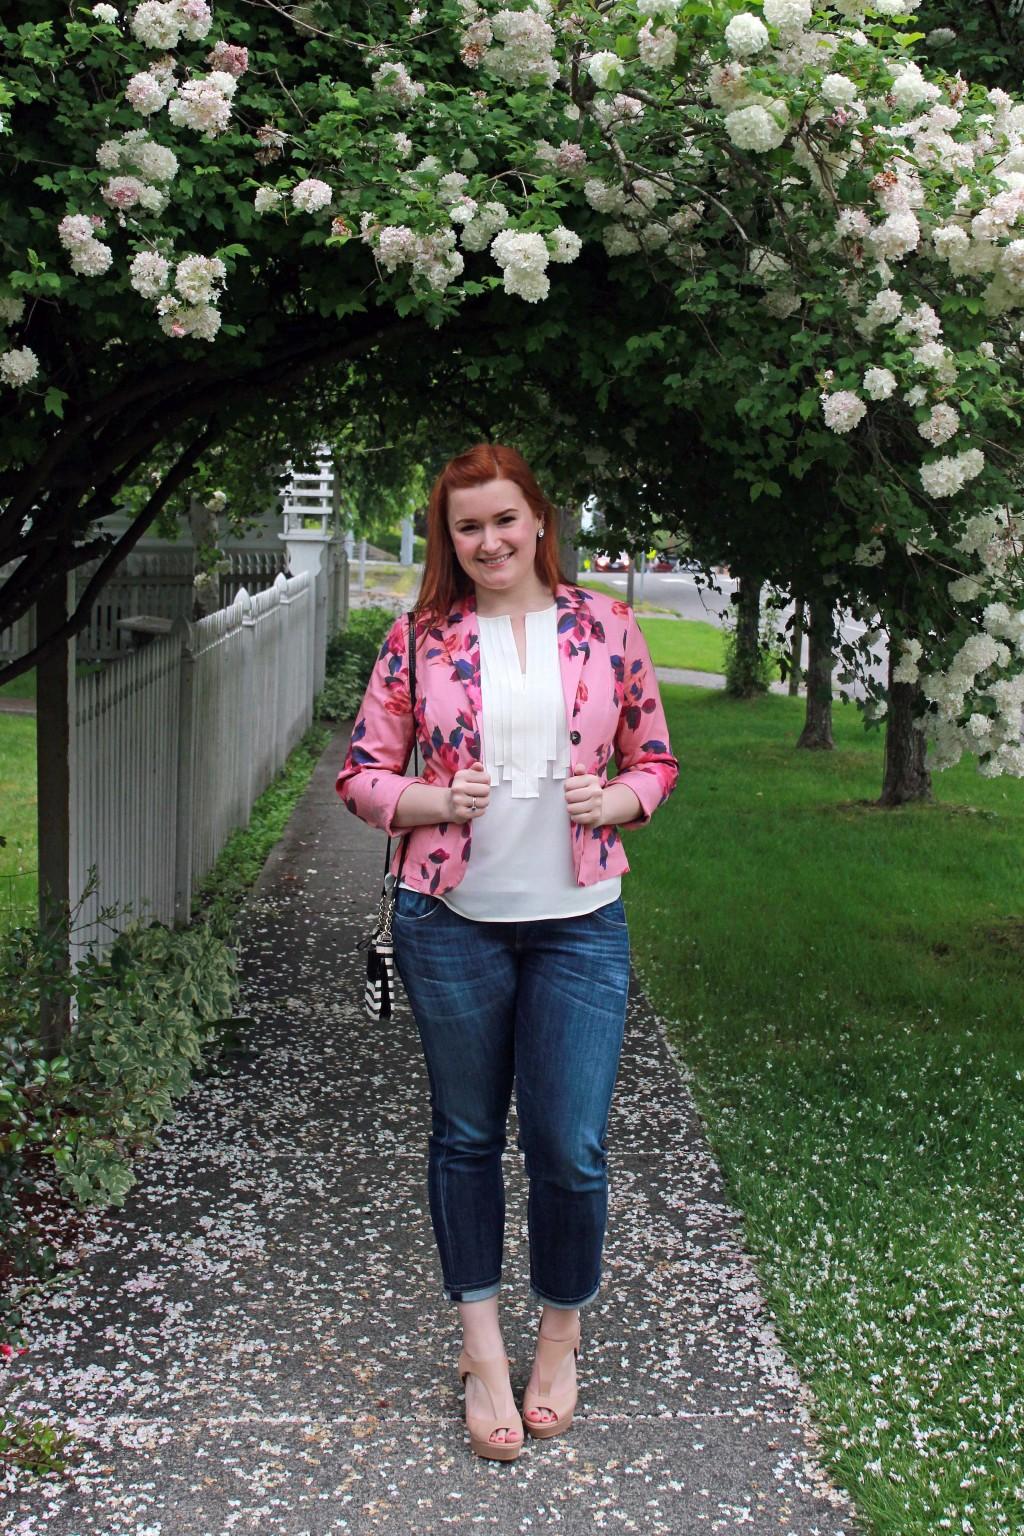 Kaitlynn Retherford, Seattle Fashion Blogger